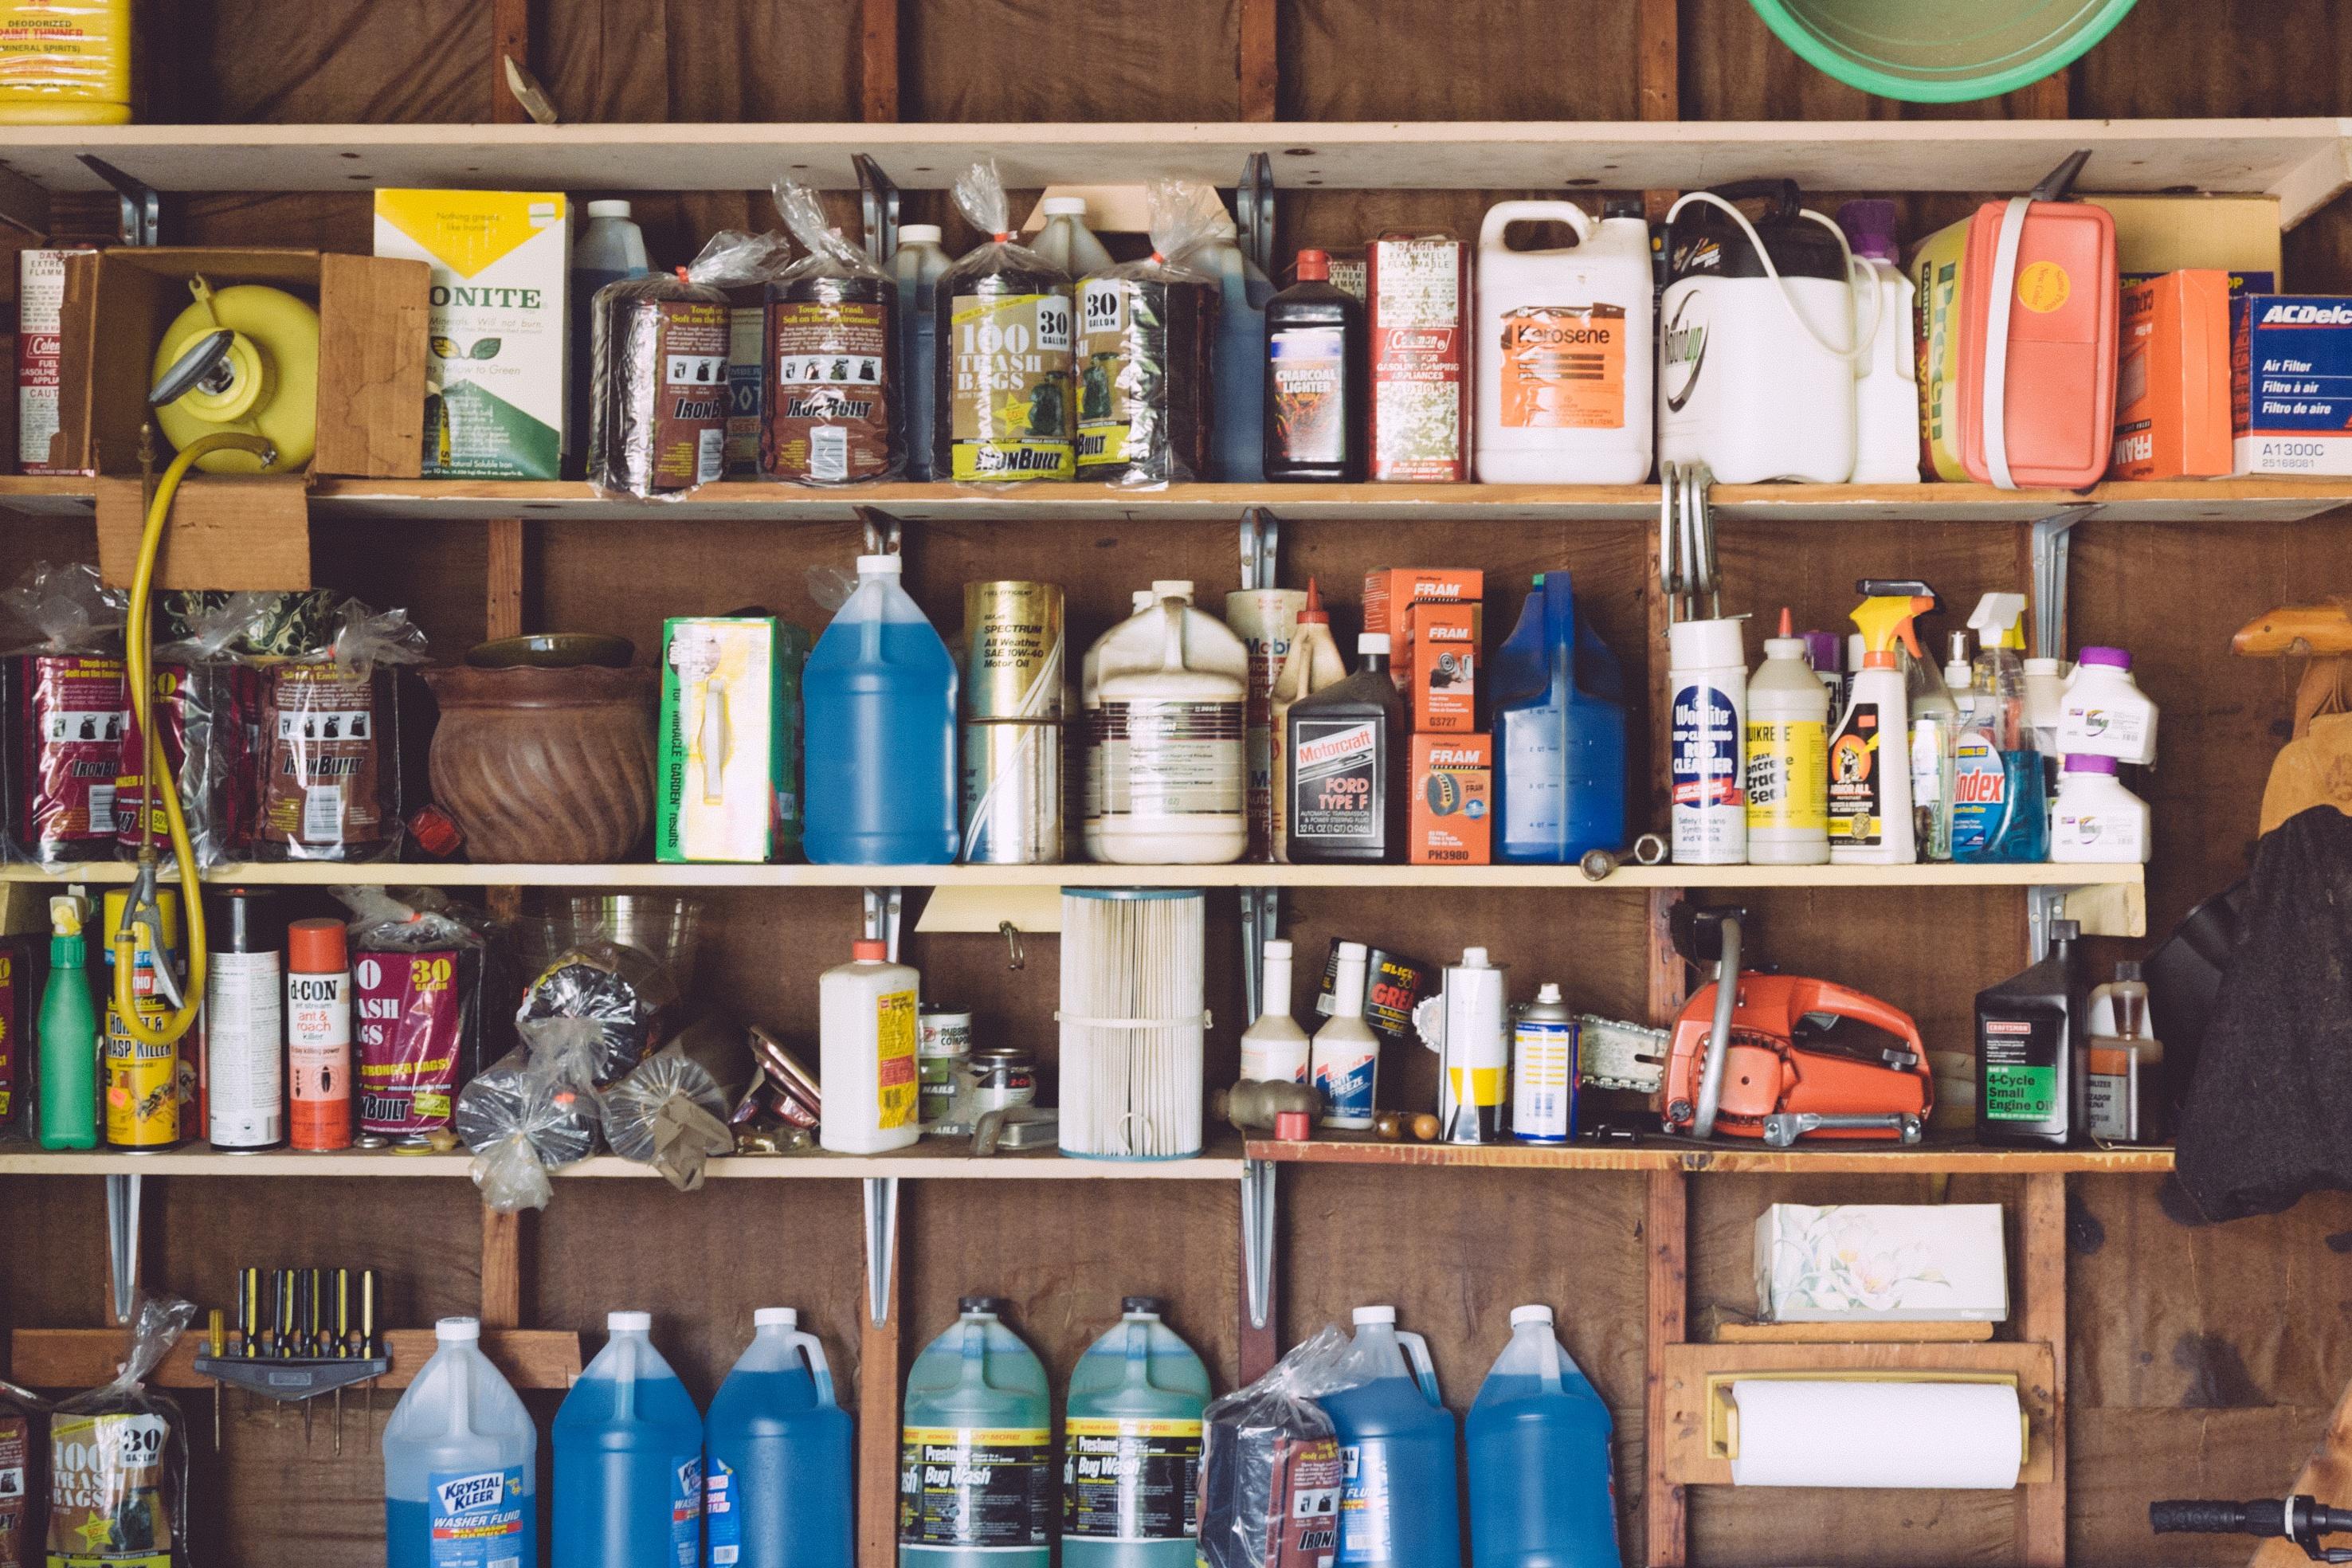 Speisekammer Regal kostenlose foto regal möbel zimmer regale speisekammer